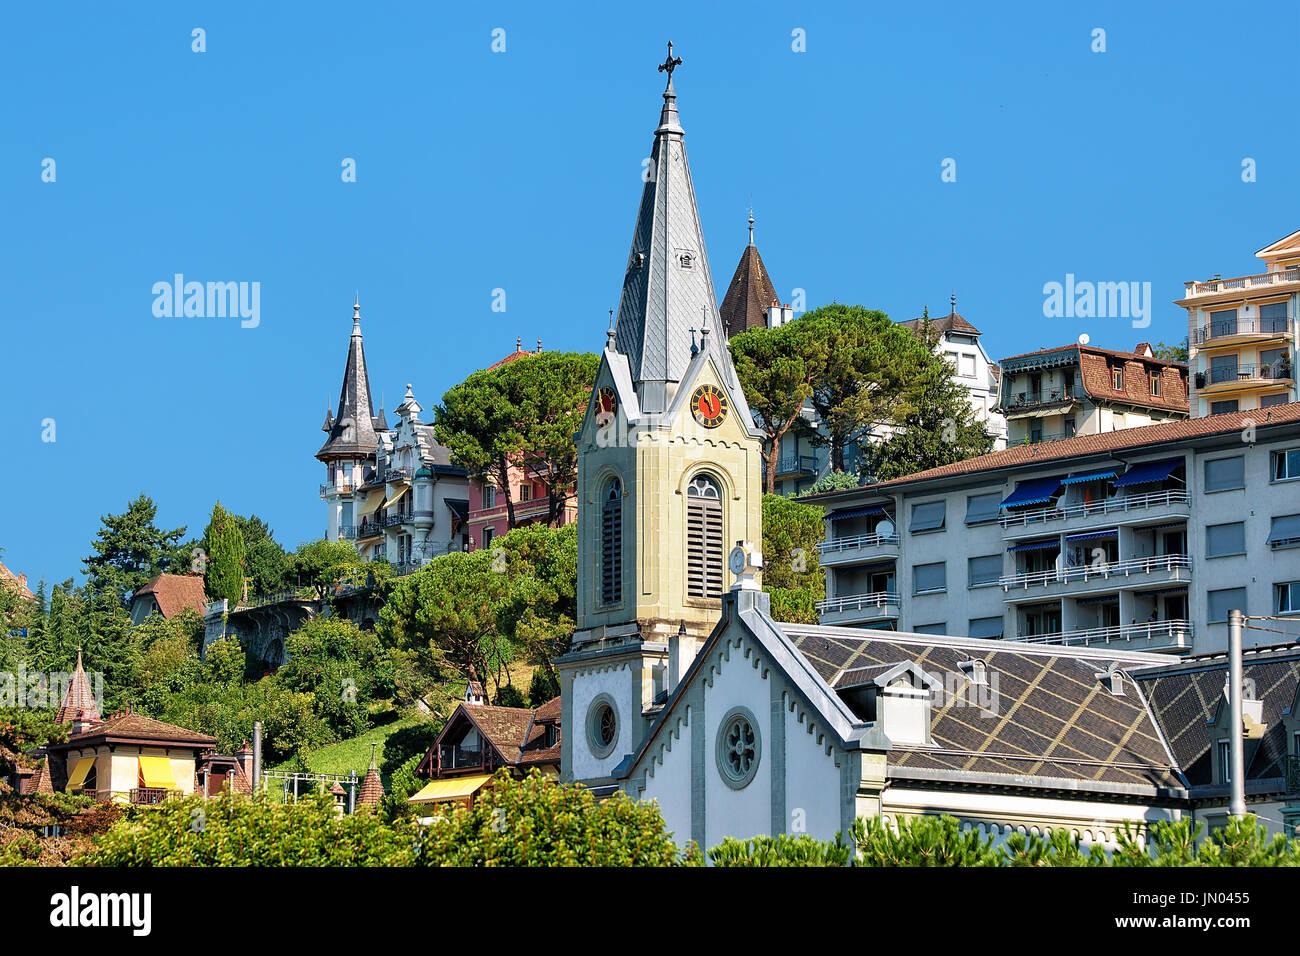 Church clock tower at Geneva Lake in Montreux, Swiss Riviera - Stock Image